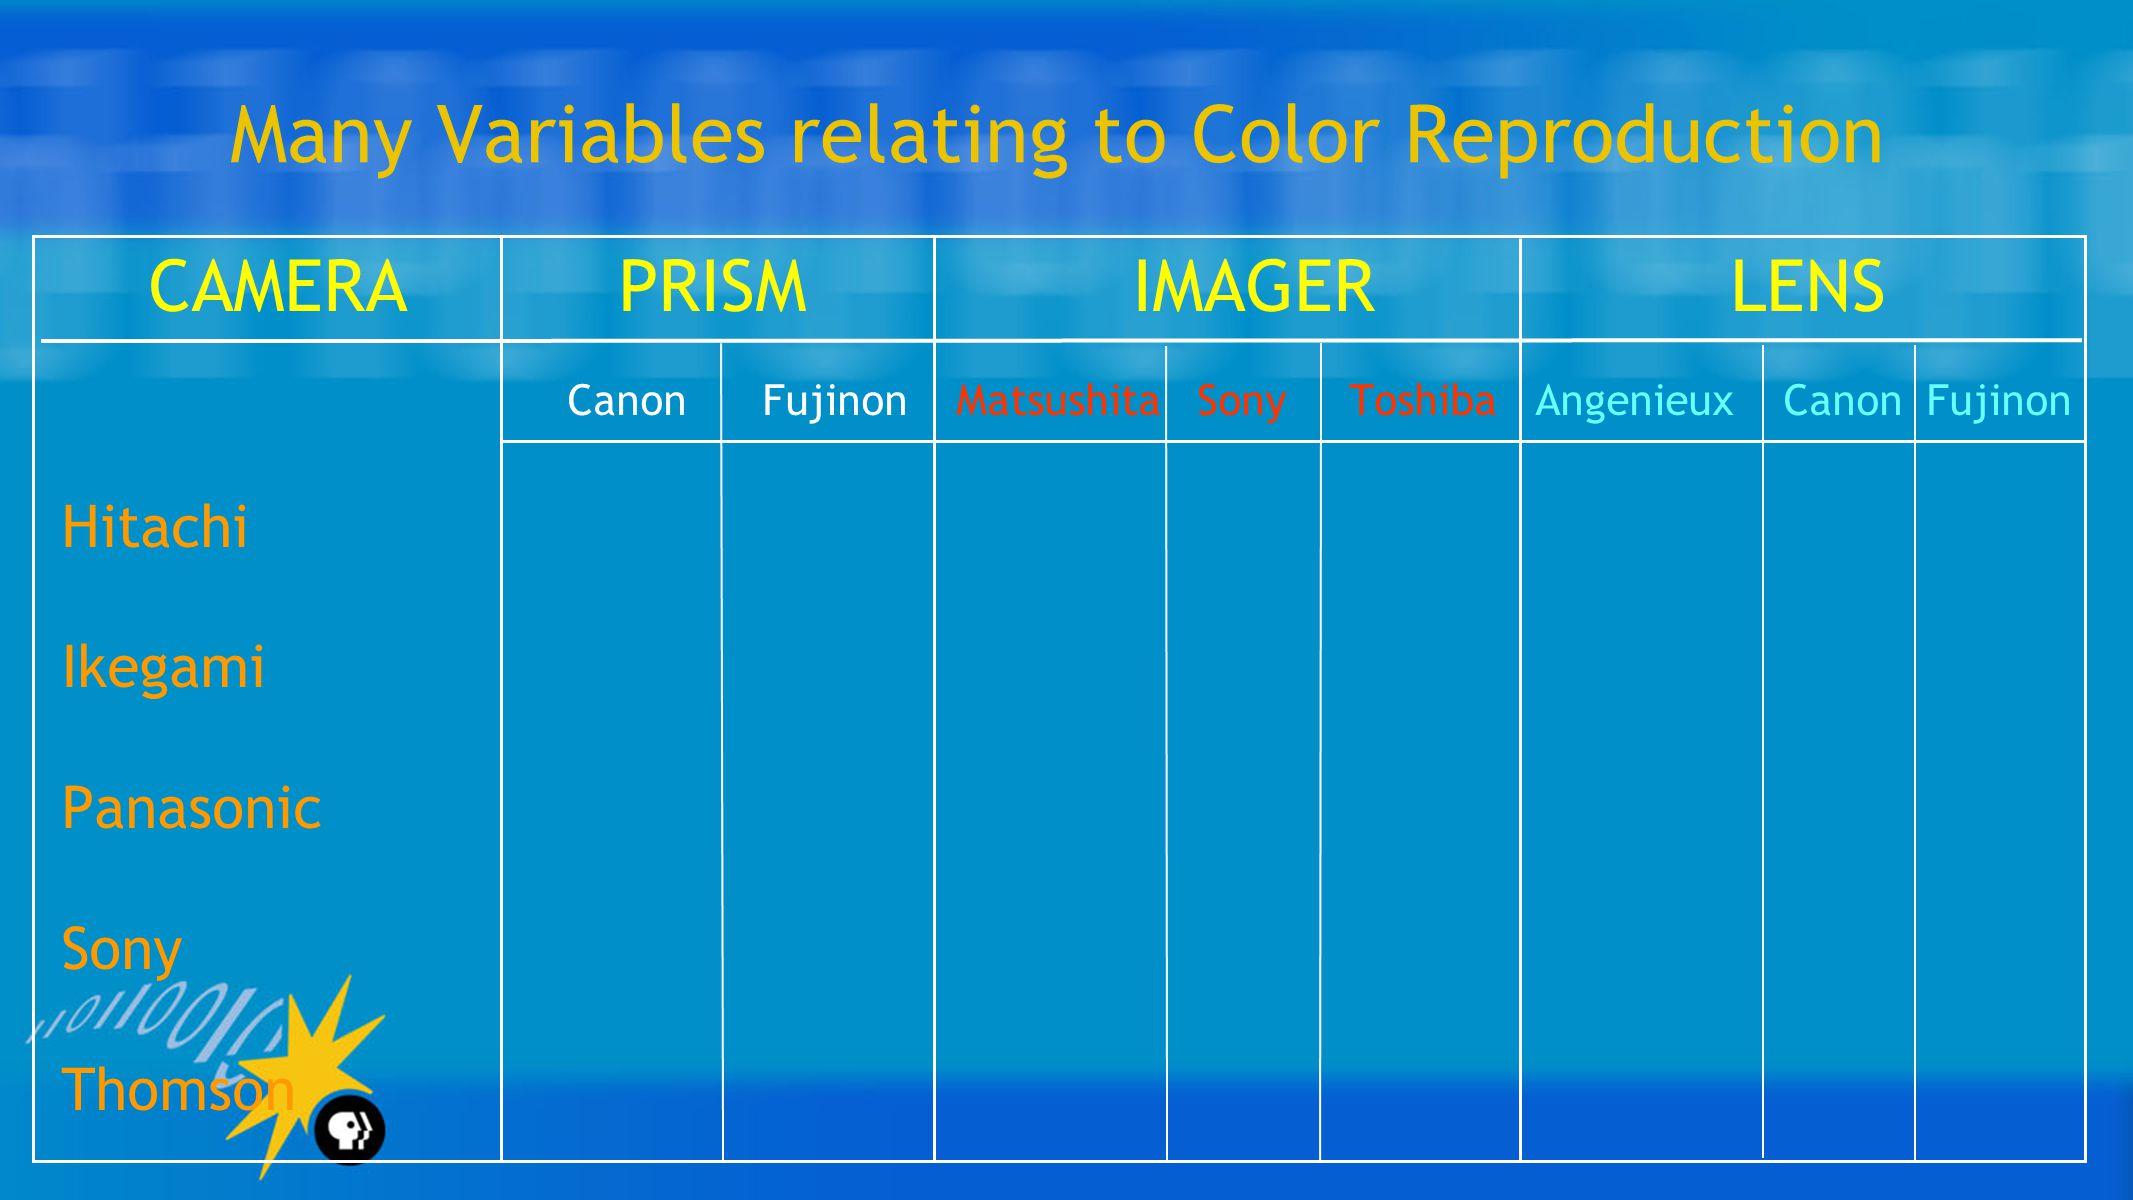 Many Variables relating to Color Reproduction CAMERA PRISM IMAGER LENS Canon Fujinon Matsushita Sony Toshiba Angenieux Canon Fujinon Hitachi Ikegami Panasonic Sony Thomson